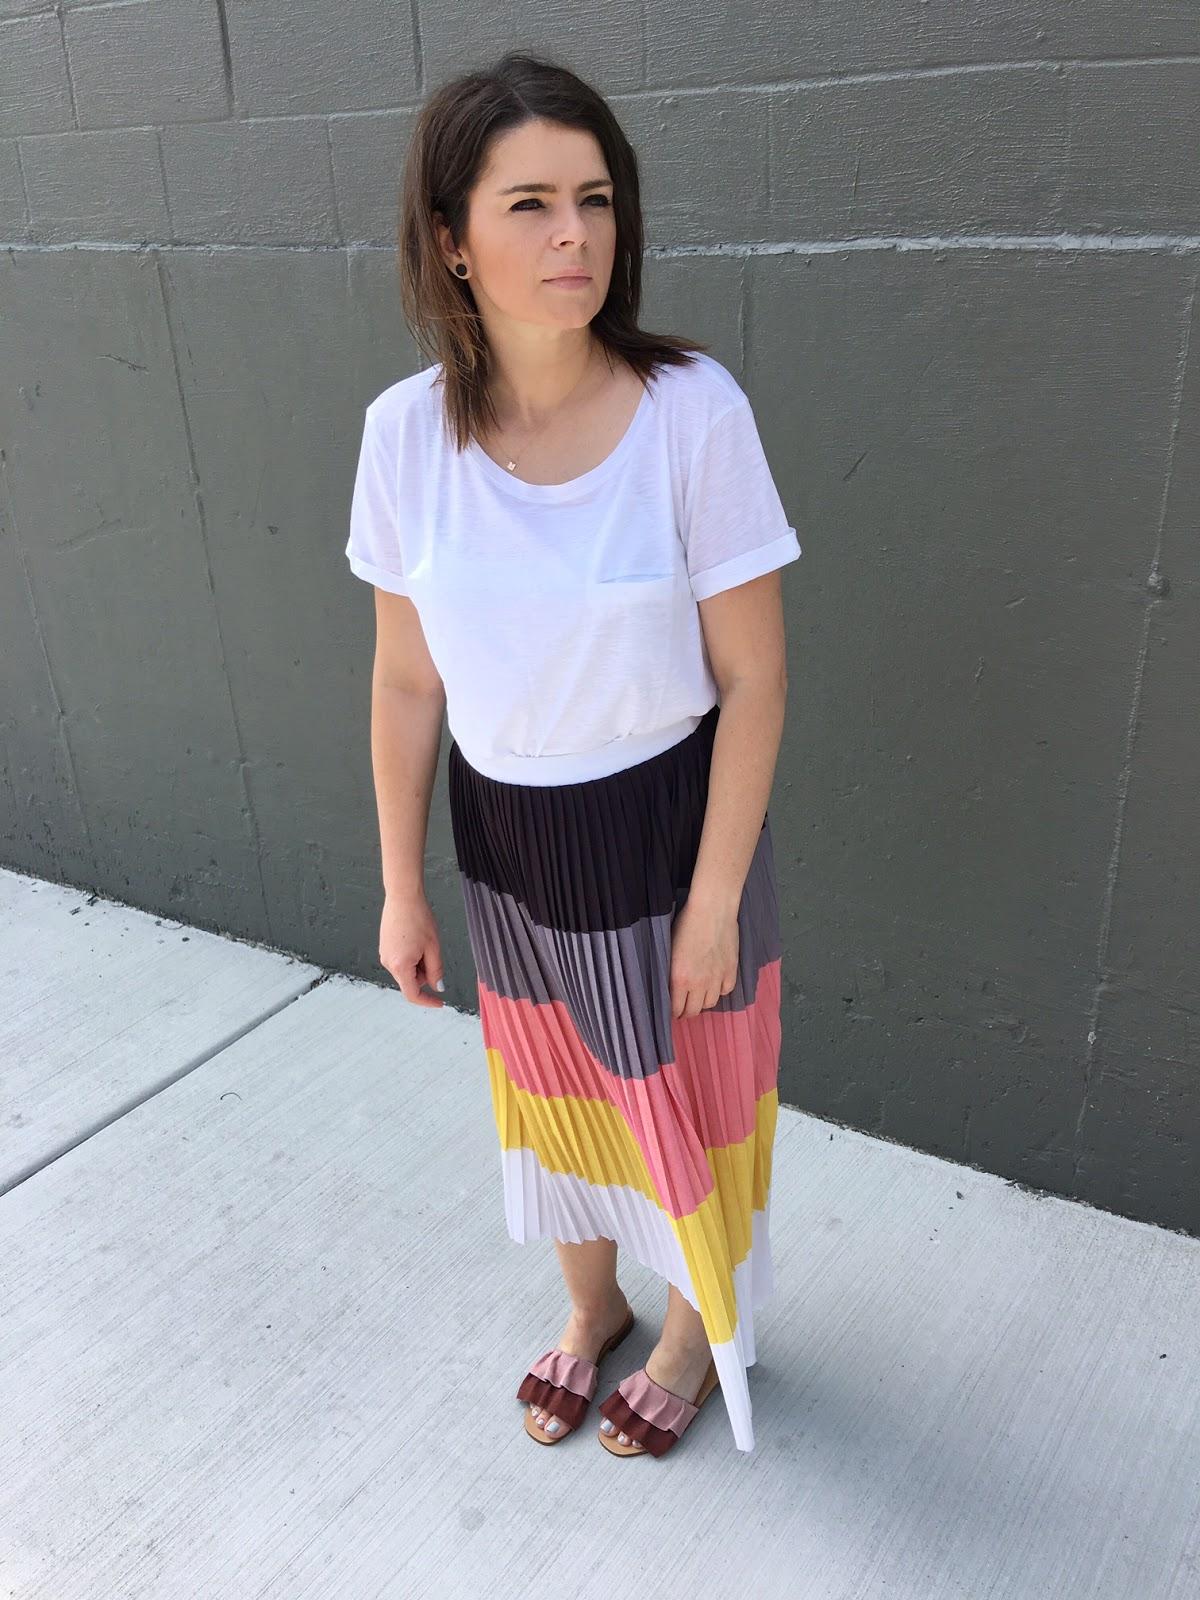 Pleated midi skirt in color block